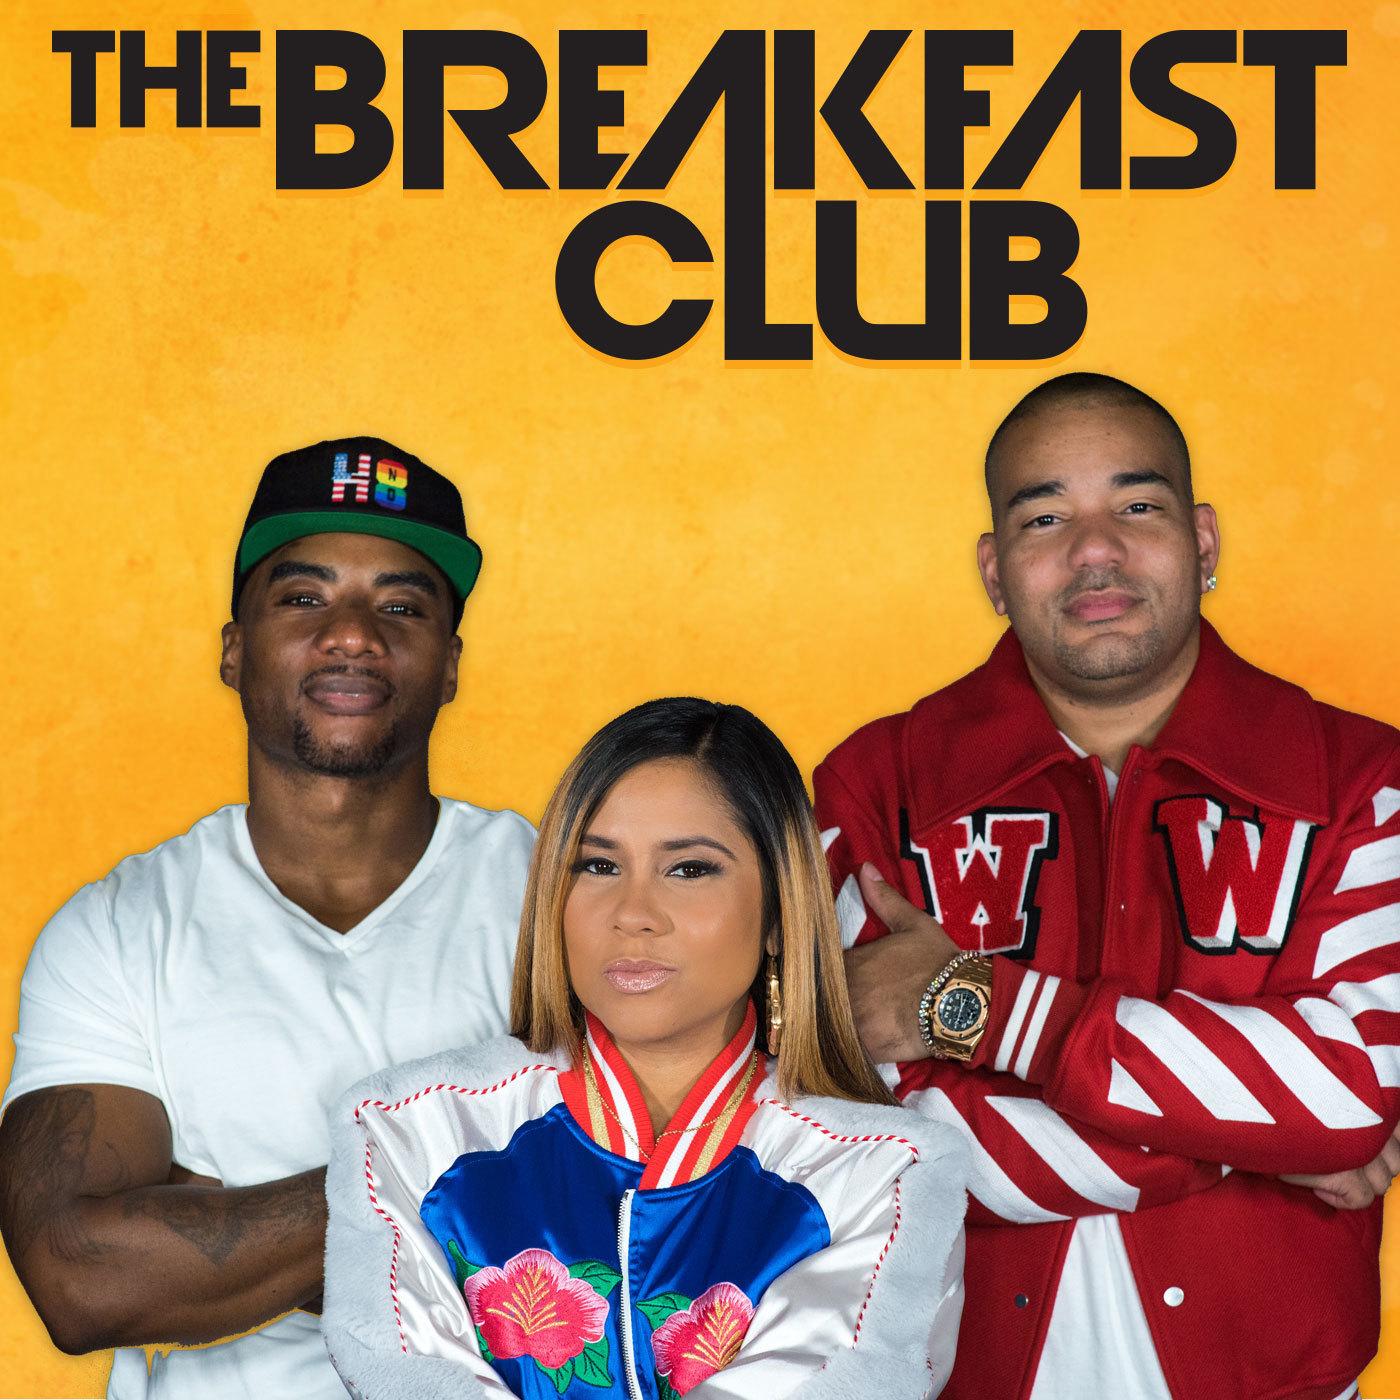 Best of The Breakfast Club : Lena Waithe/ Shoot Your Shot/ Migos